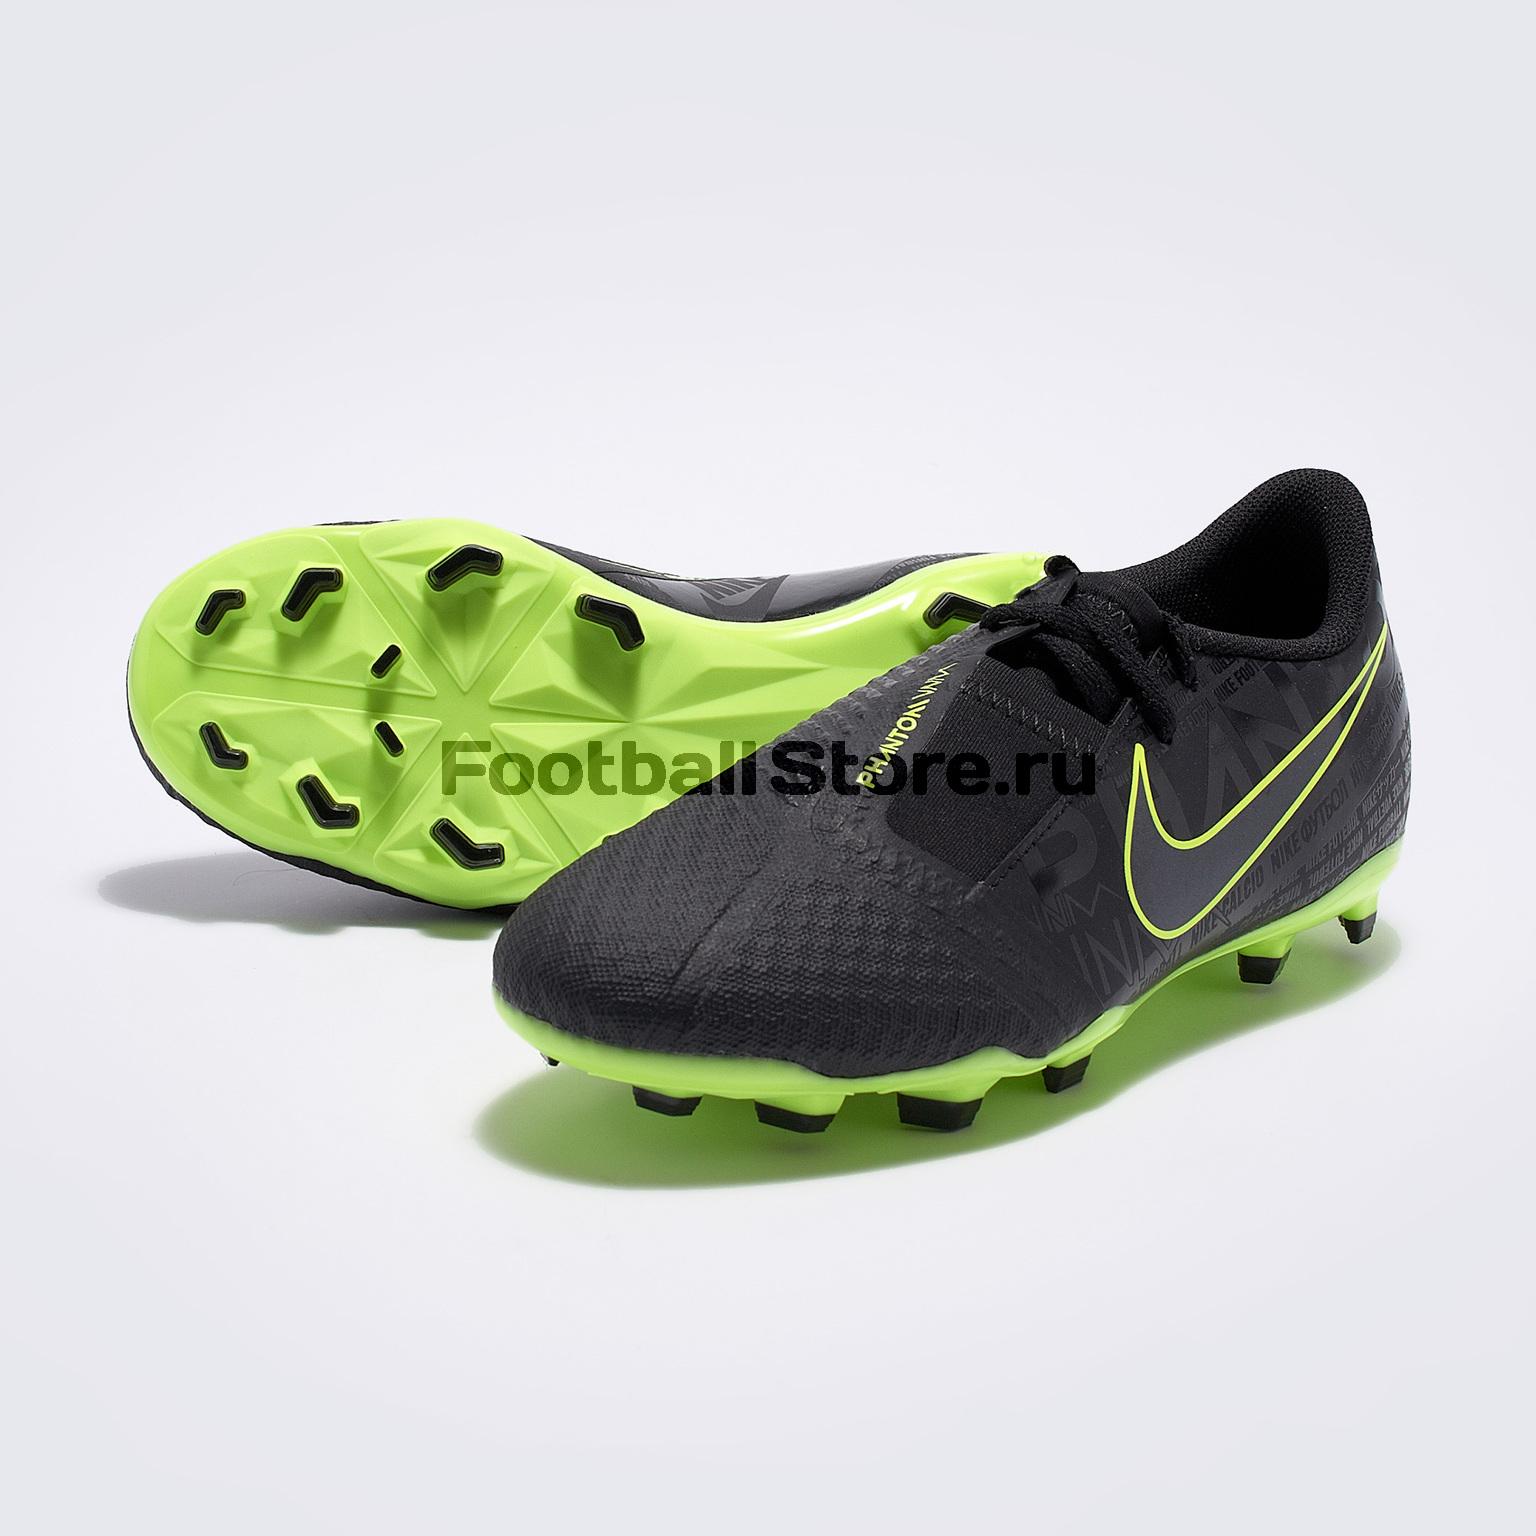 Бутсы детские Nike Phantom Venom Academy FG AO0362-007 цена